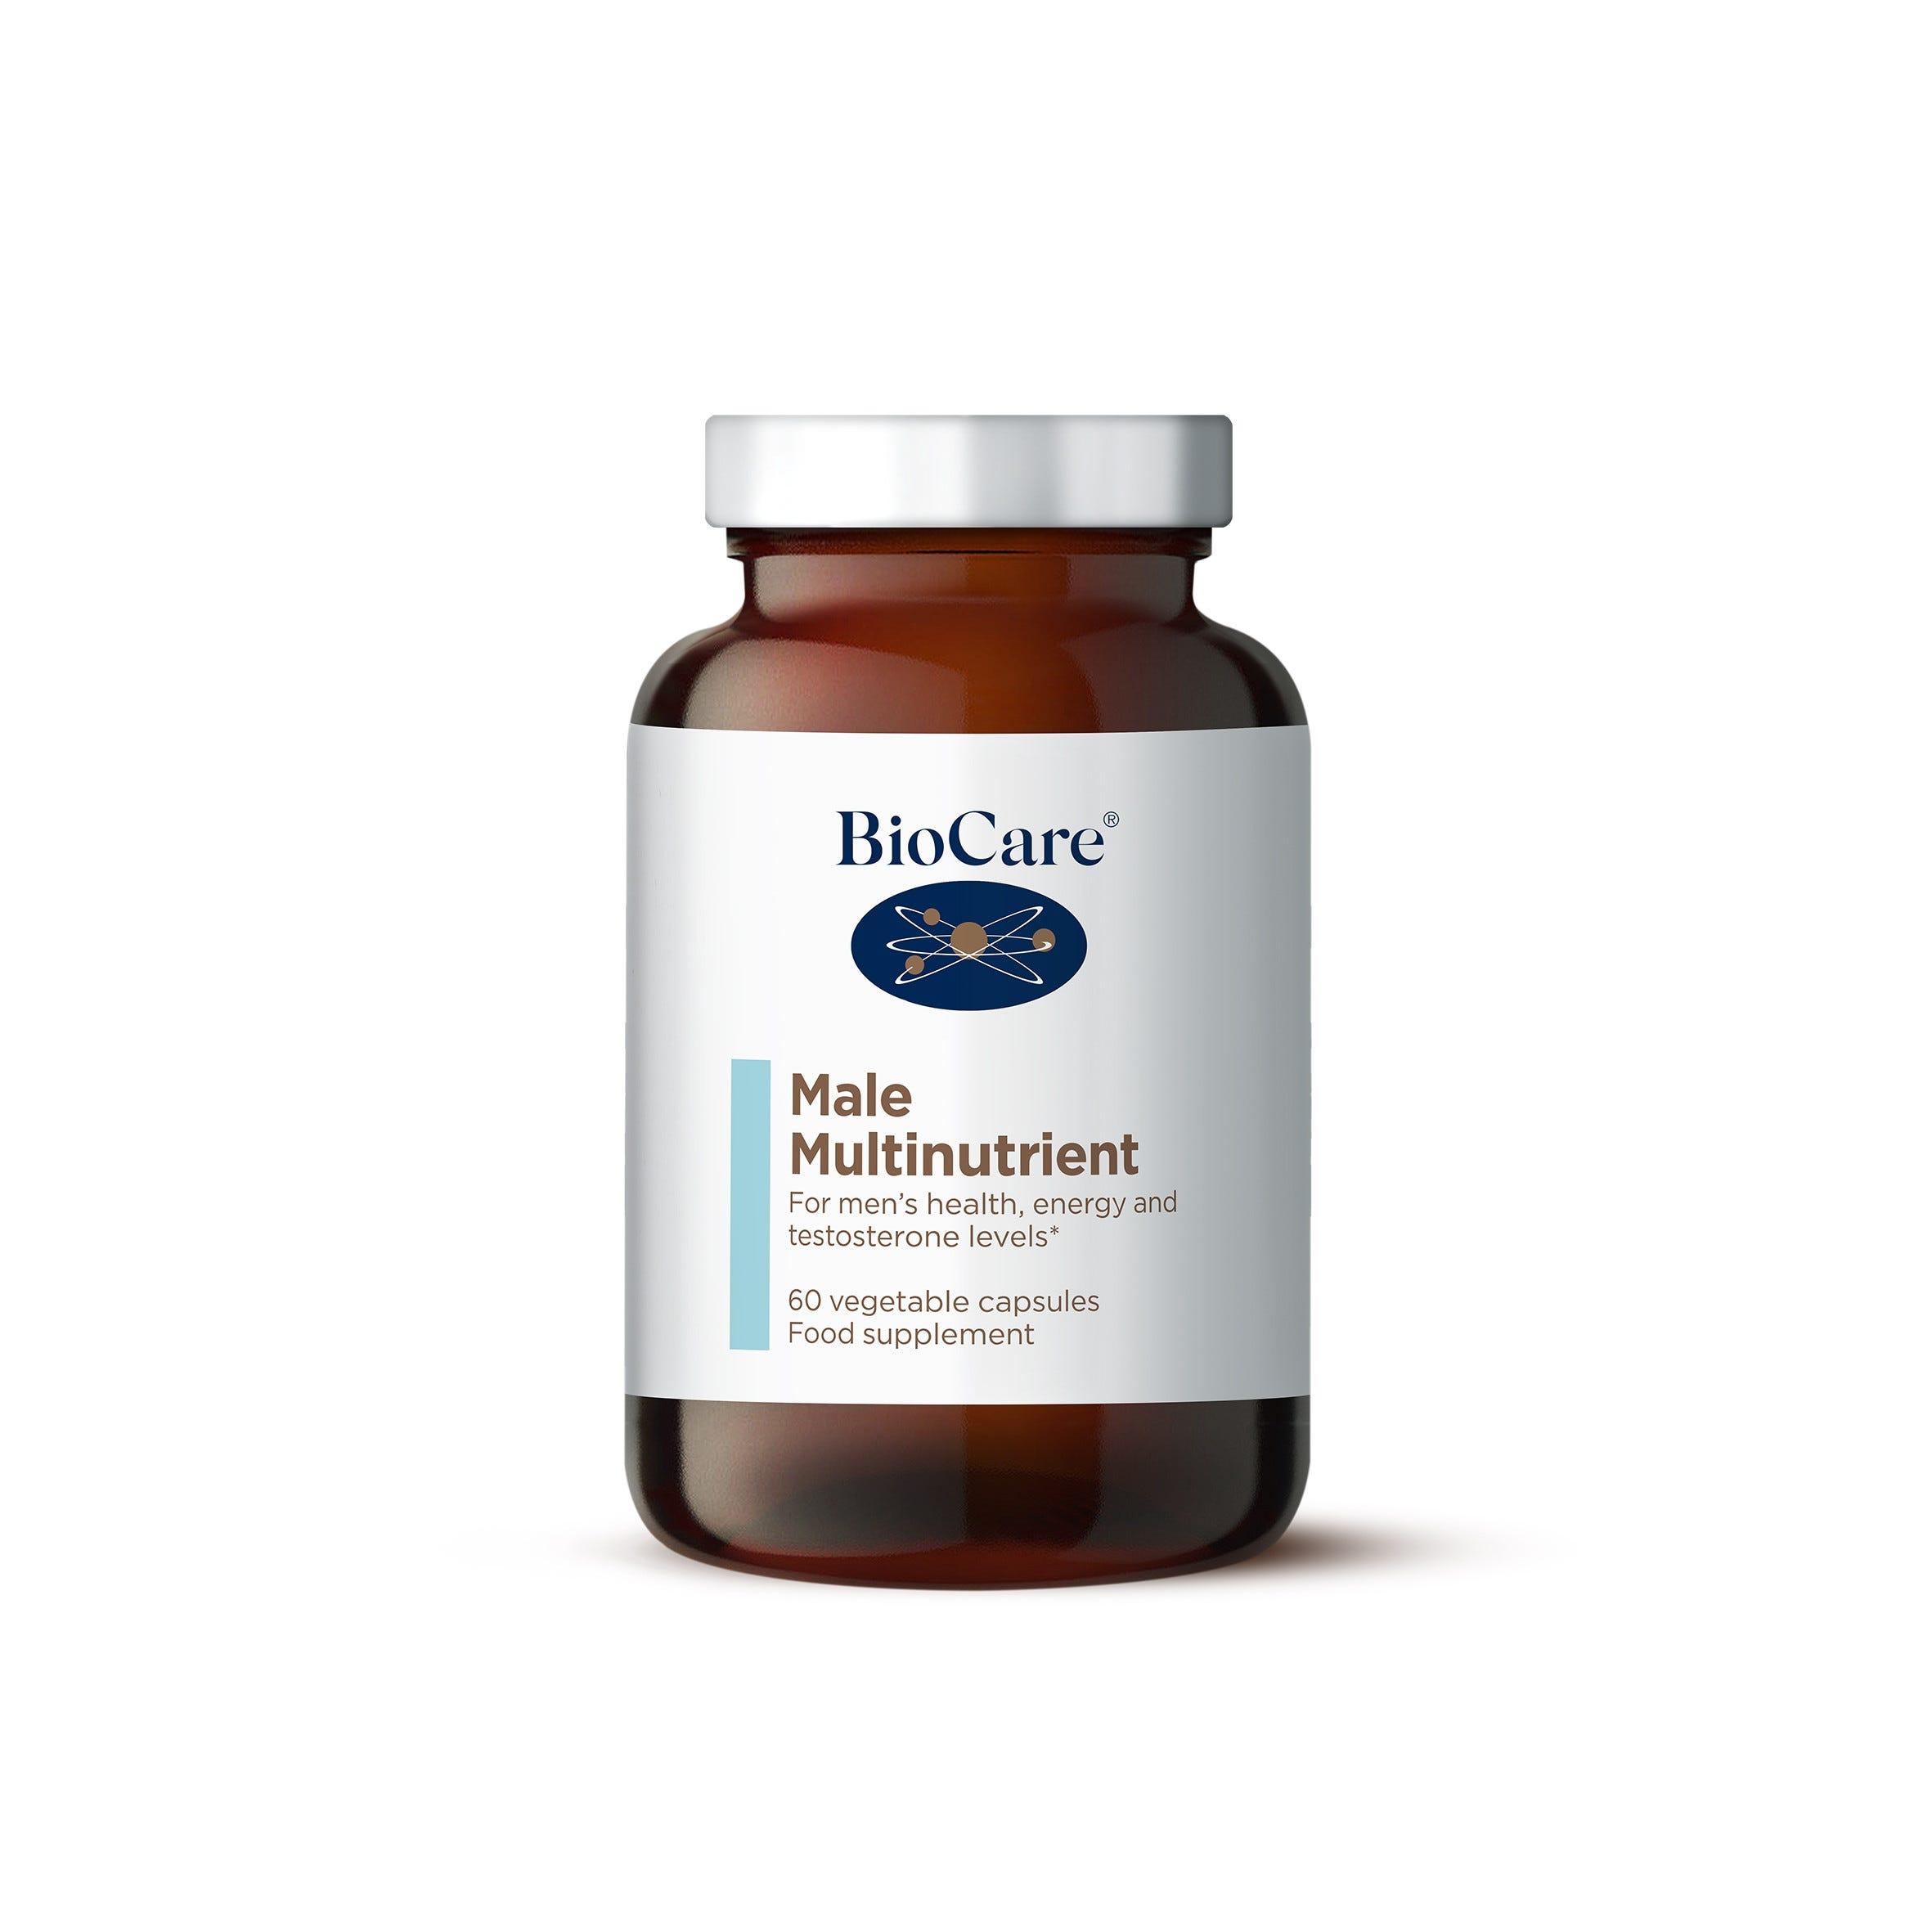 Male Multinutrient